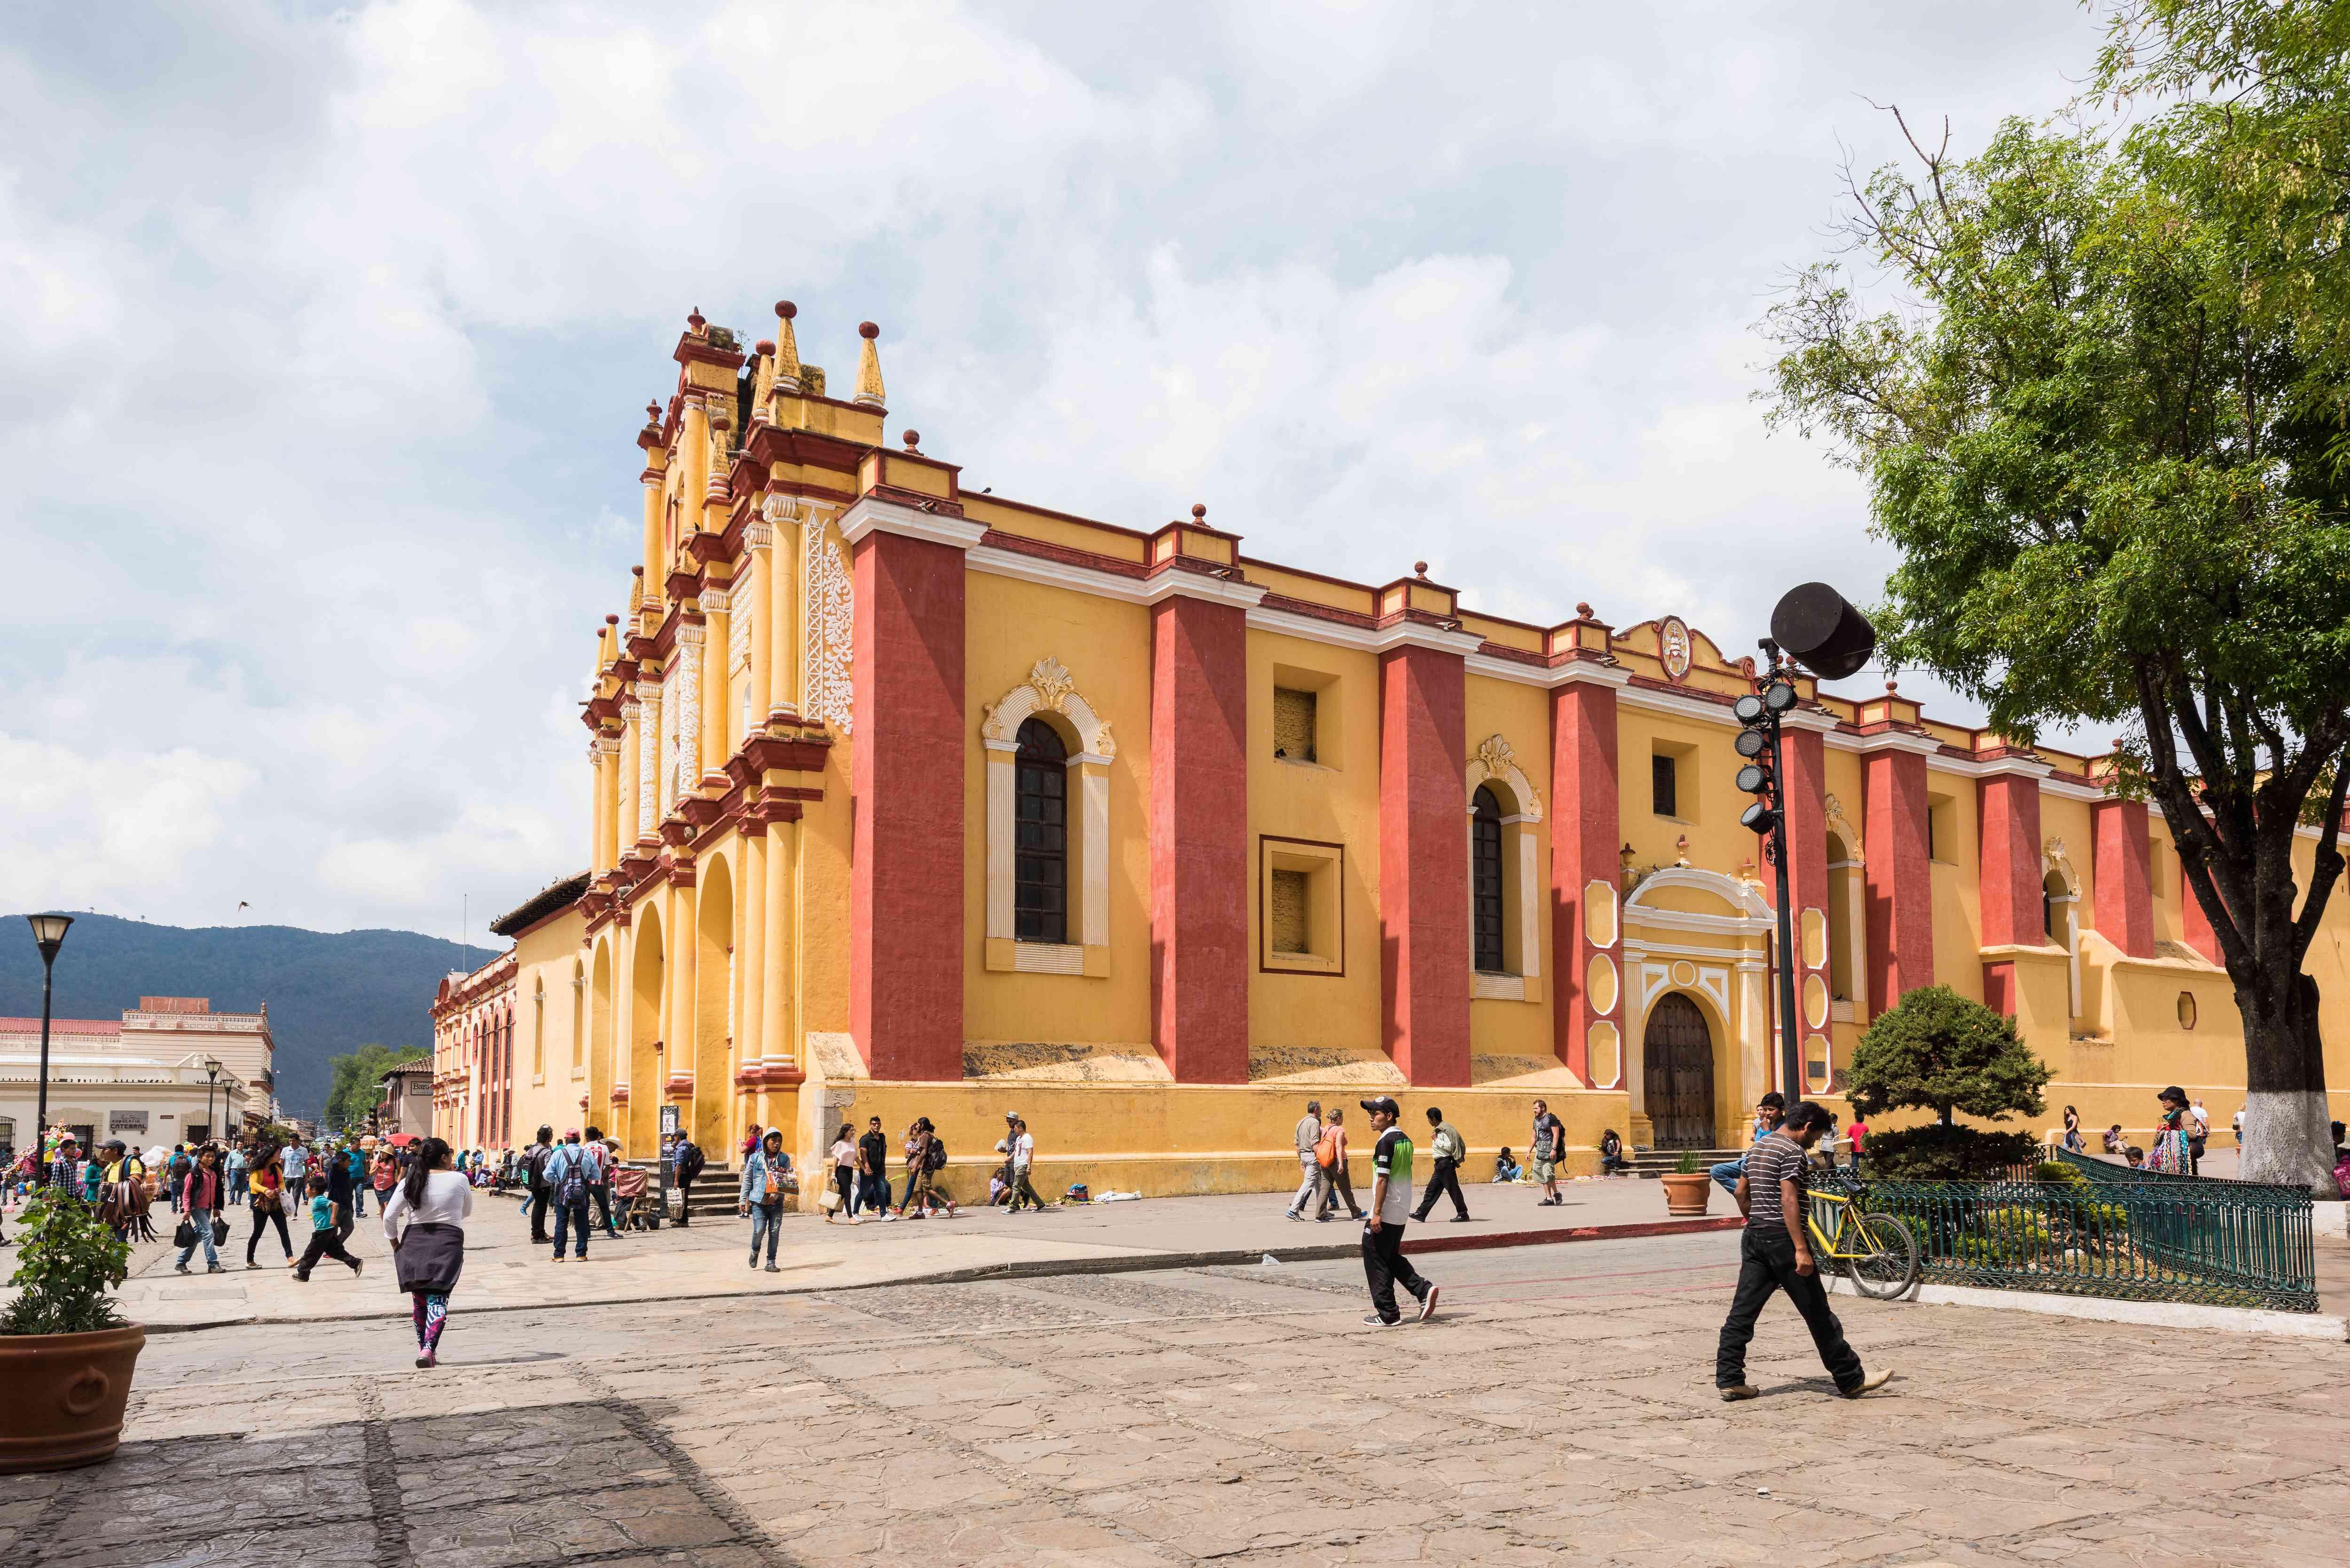 San Cristobal de las Casas in Chiapas